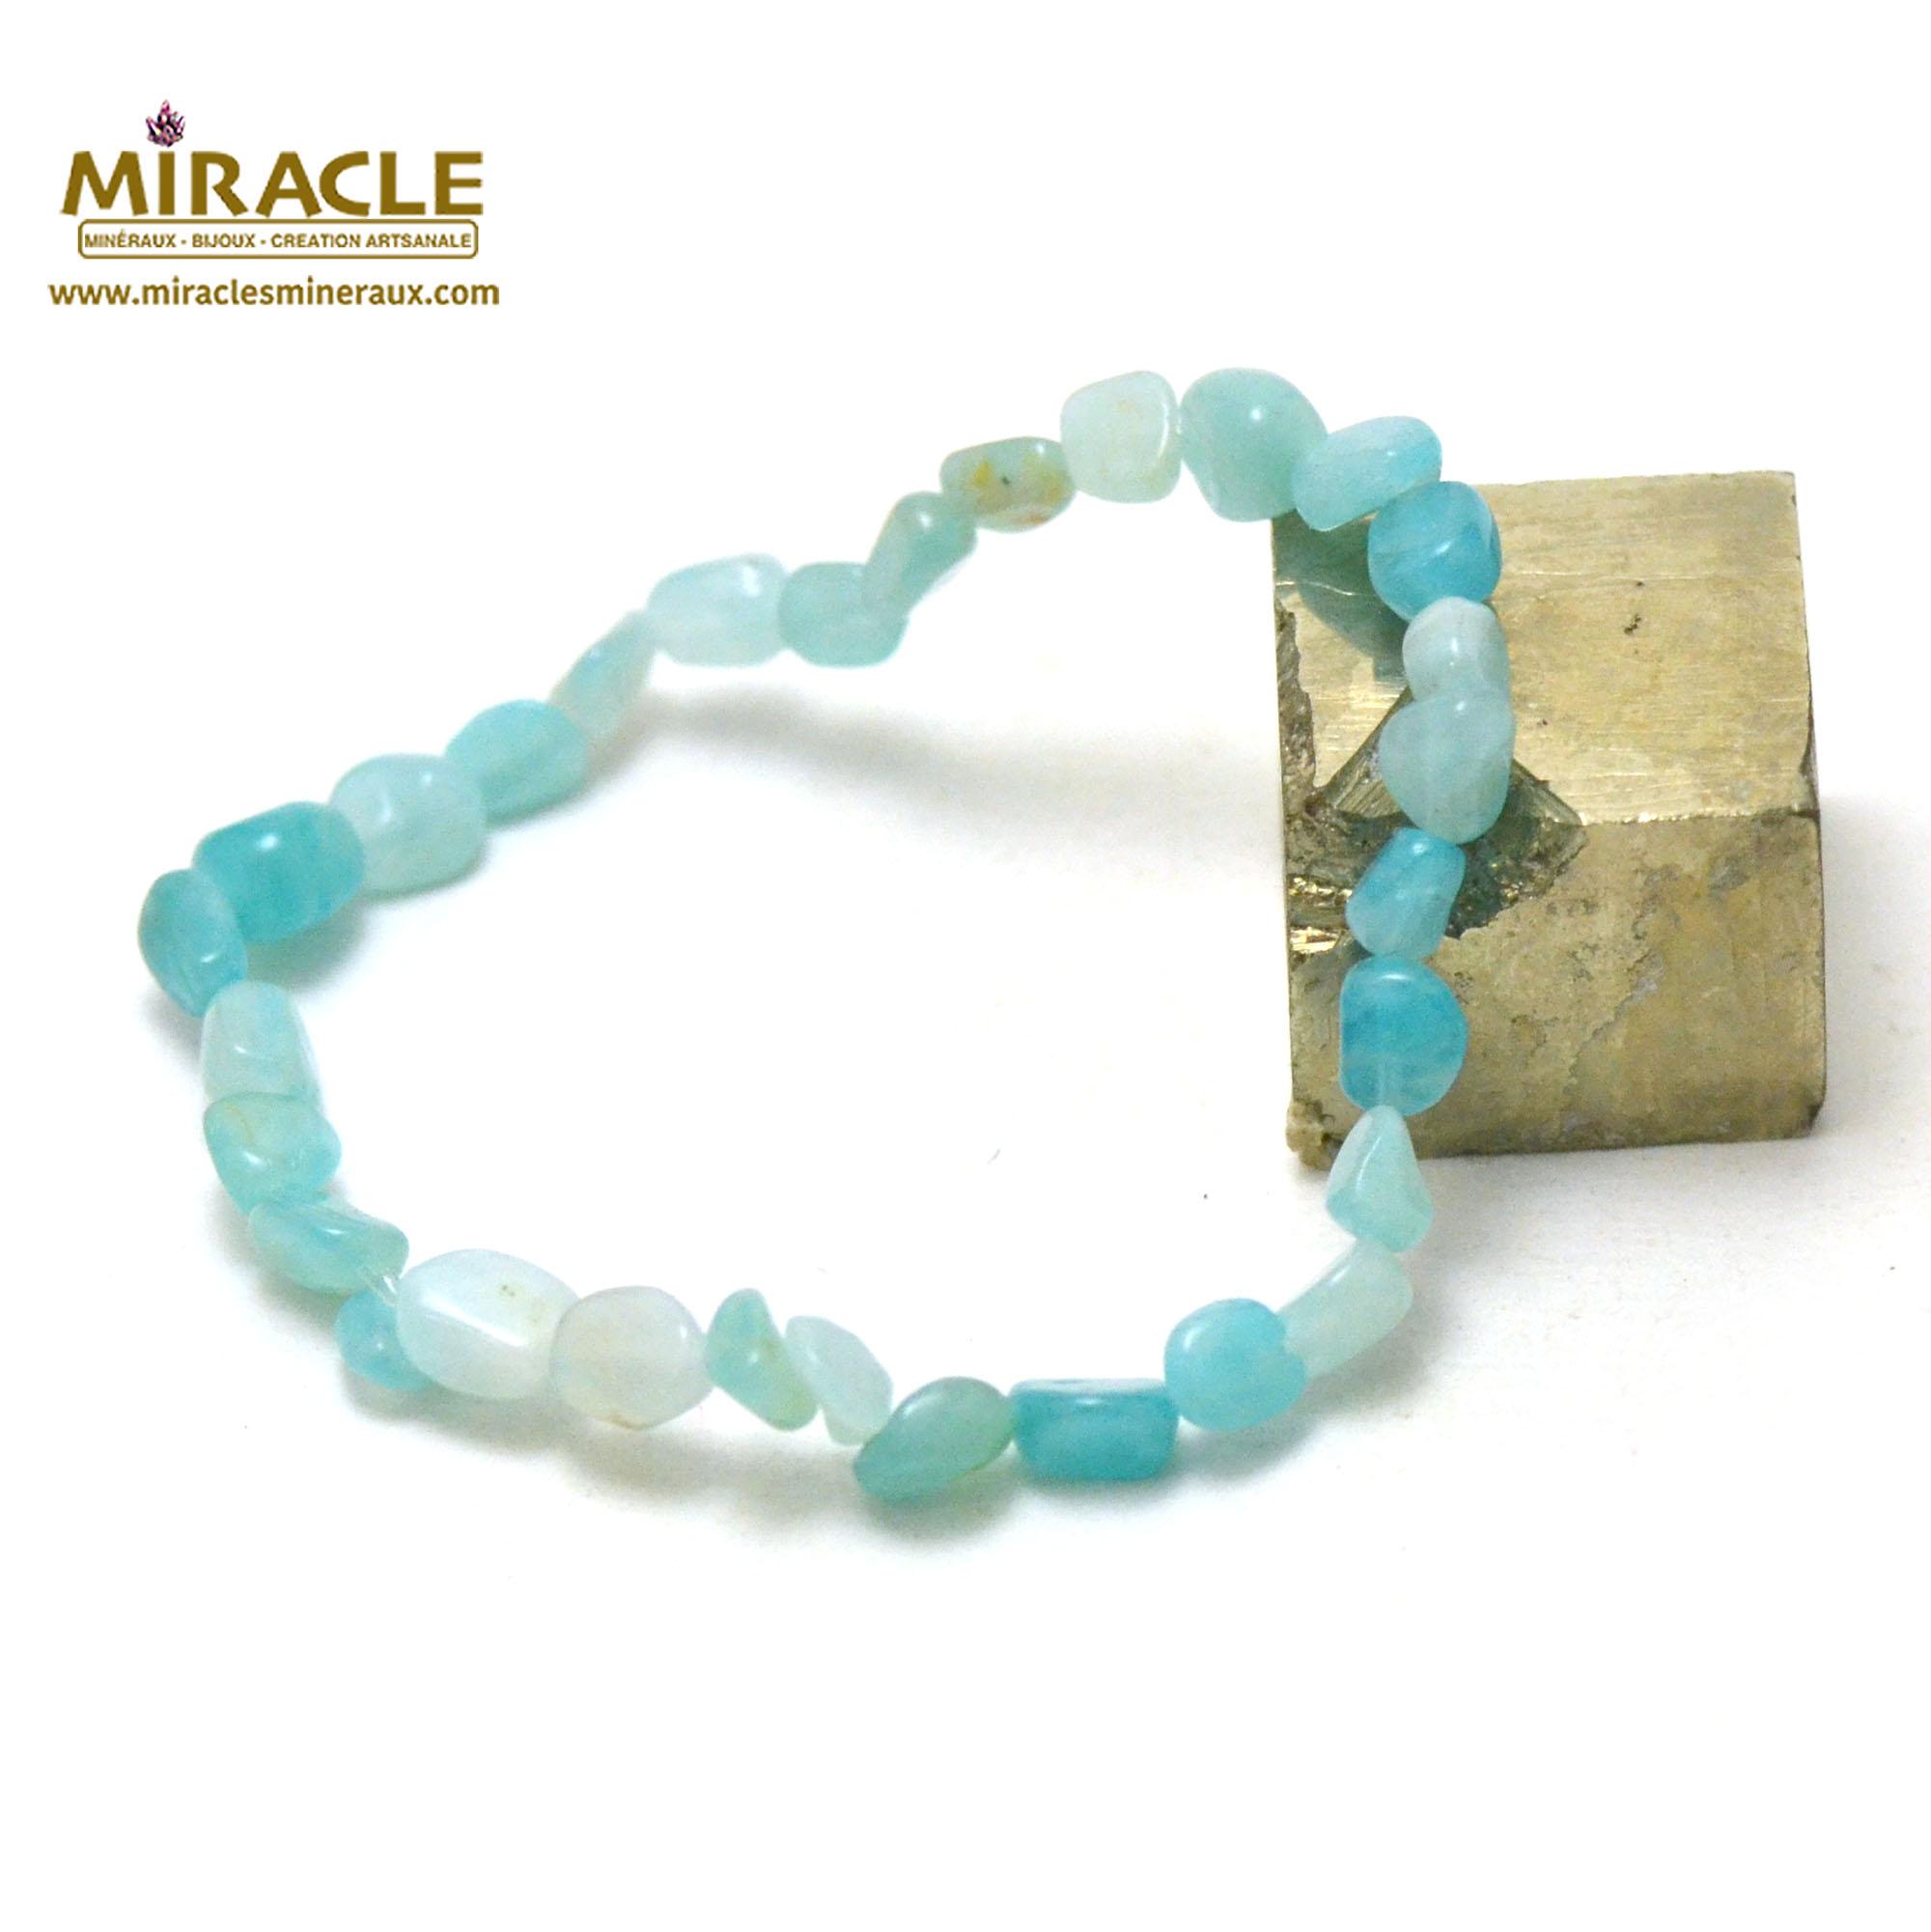 Bracelet amazonite, pierre roulée AA